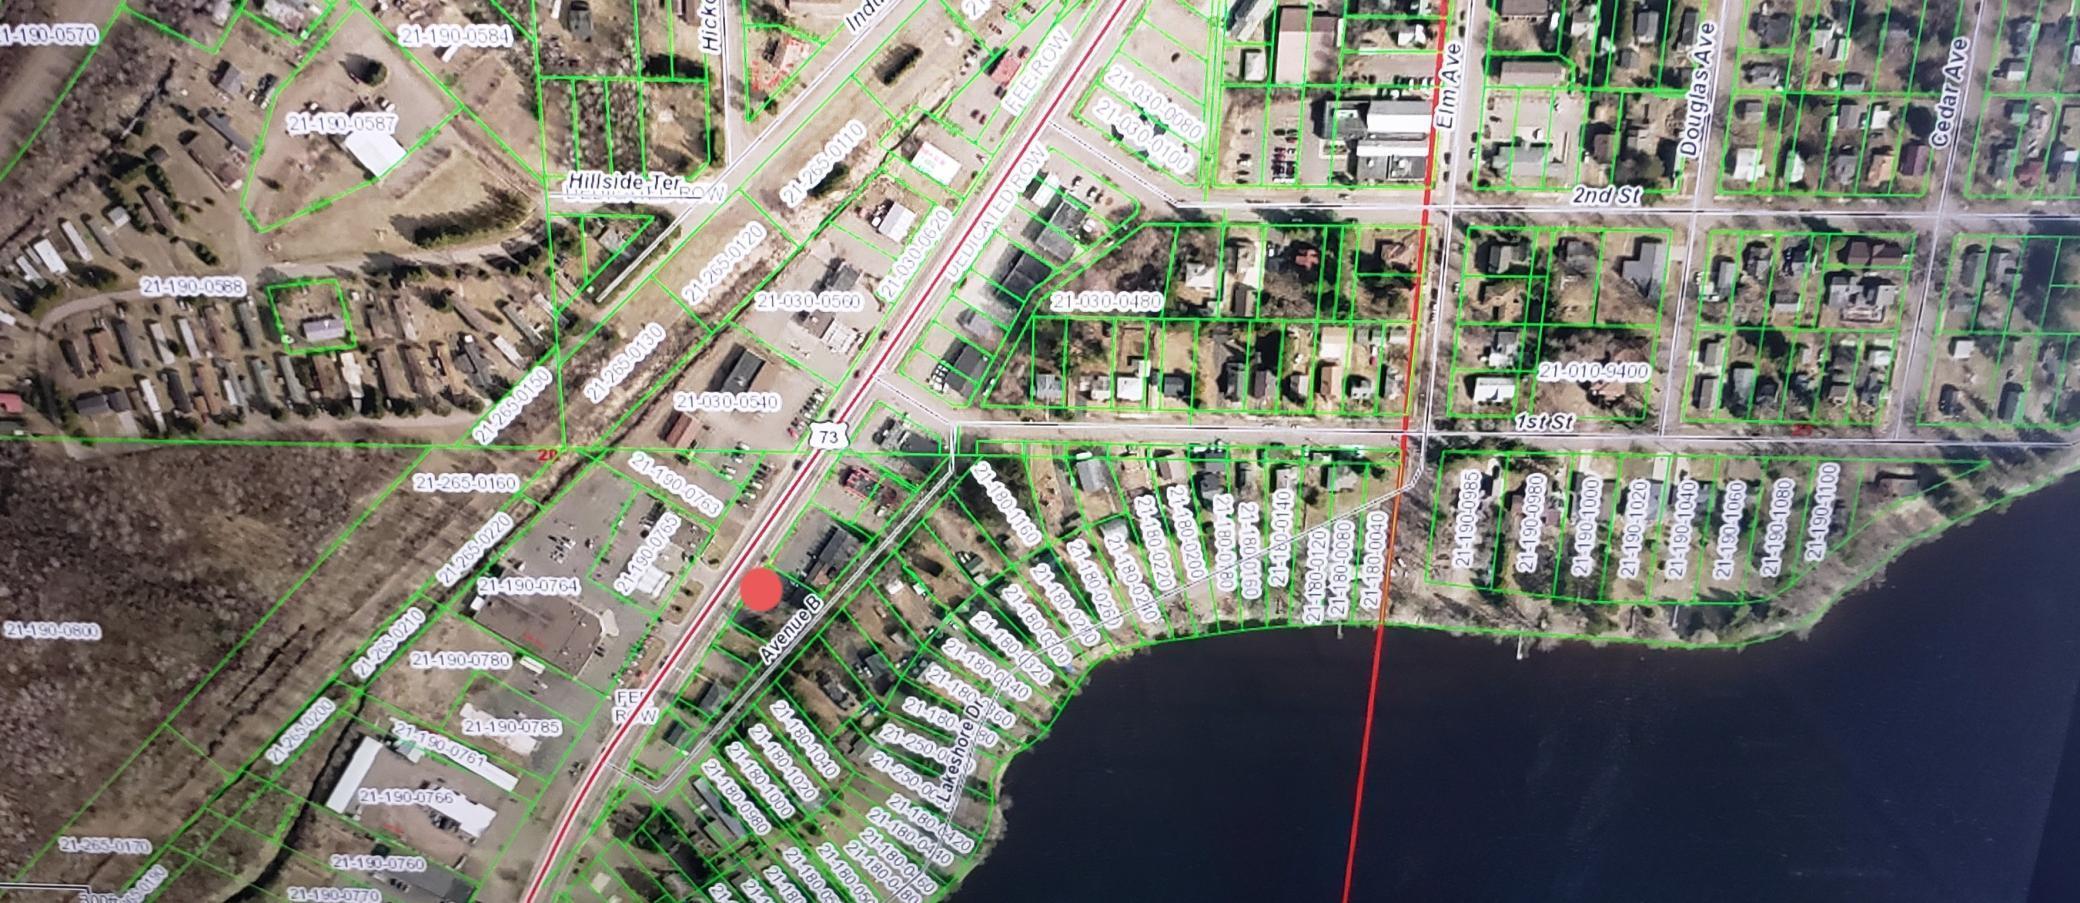 85 Arrowhead Lane Property Photo - Moose Lake, MN real estate listing